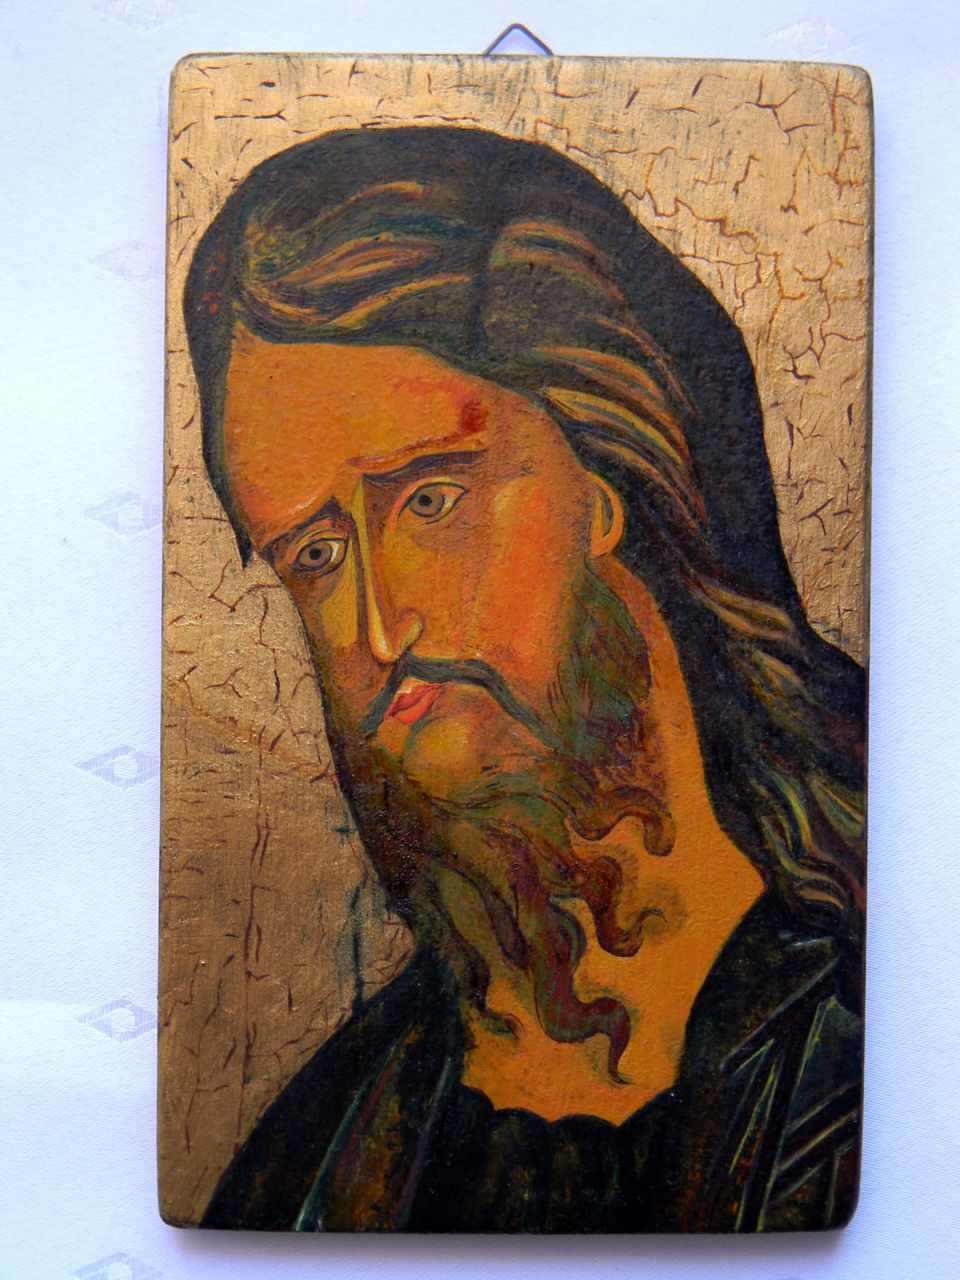 Beata-Sztark-JAN-ZWIASTUN-DEISUS-drewno tekowe-olej-19,5x12